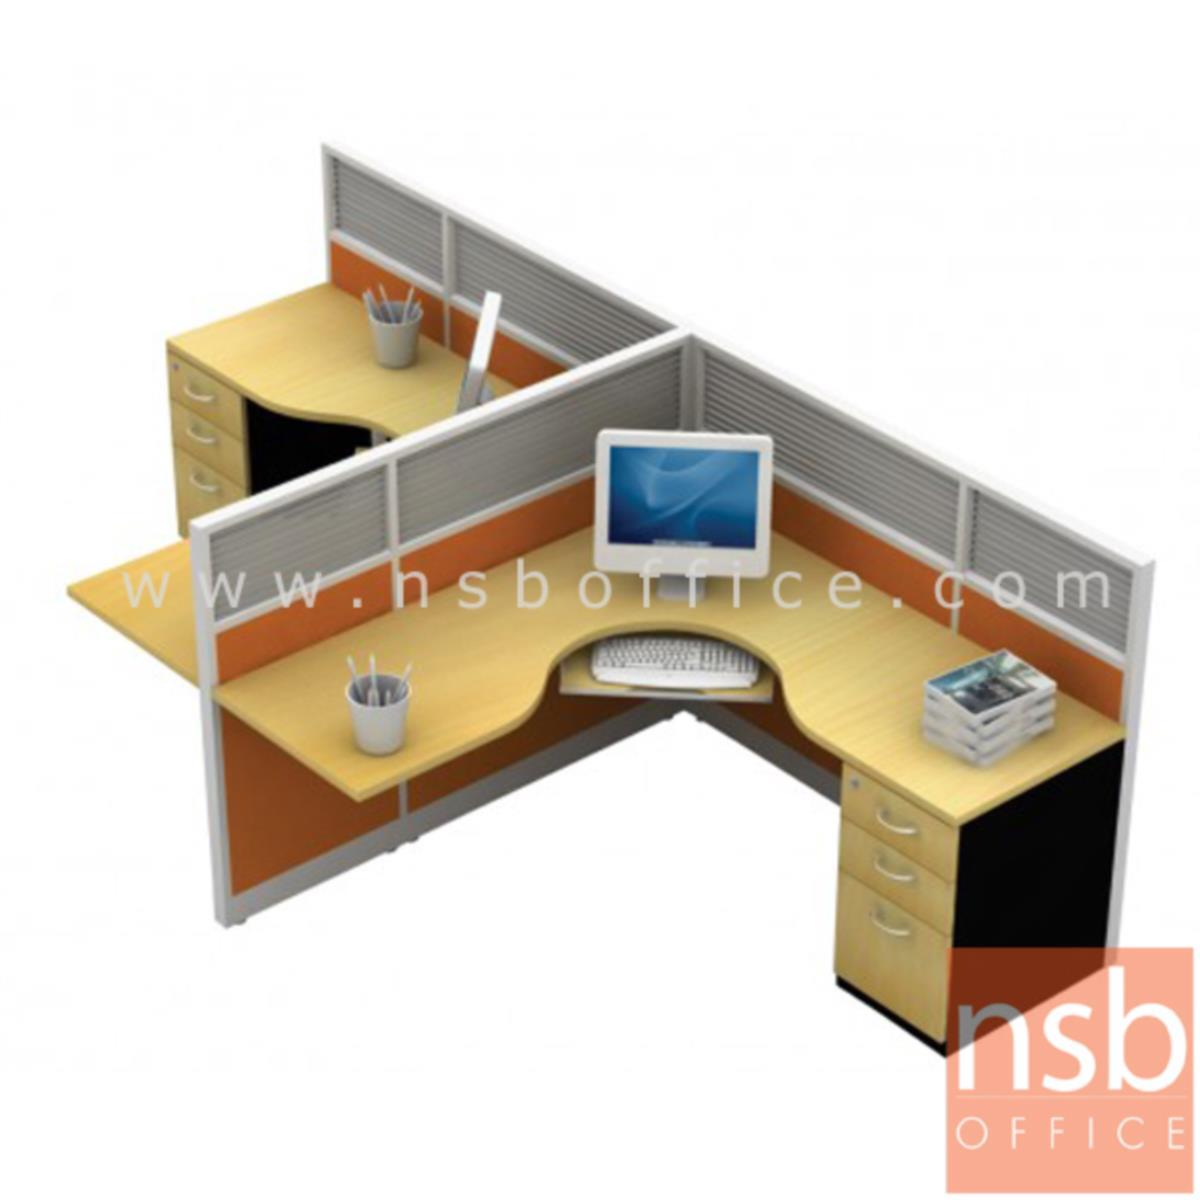 A04A042:ชุดโต๊ะทำงานกลุ่มตัวแอล 2 ที่นั่ง   ขนาดรวม 328W cm. พร้อมพาร์ทิชั่น Hybrid